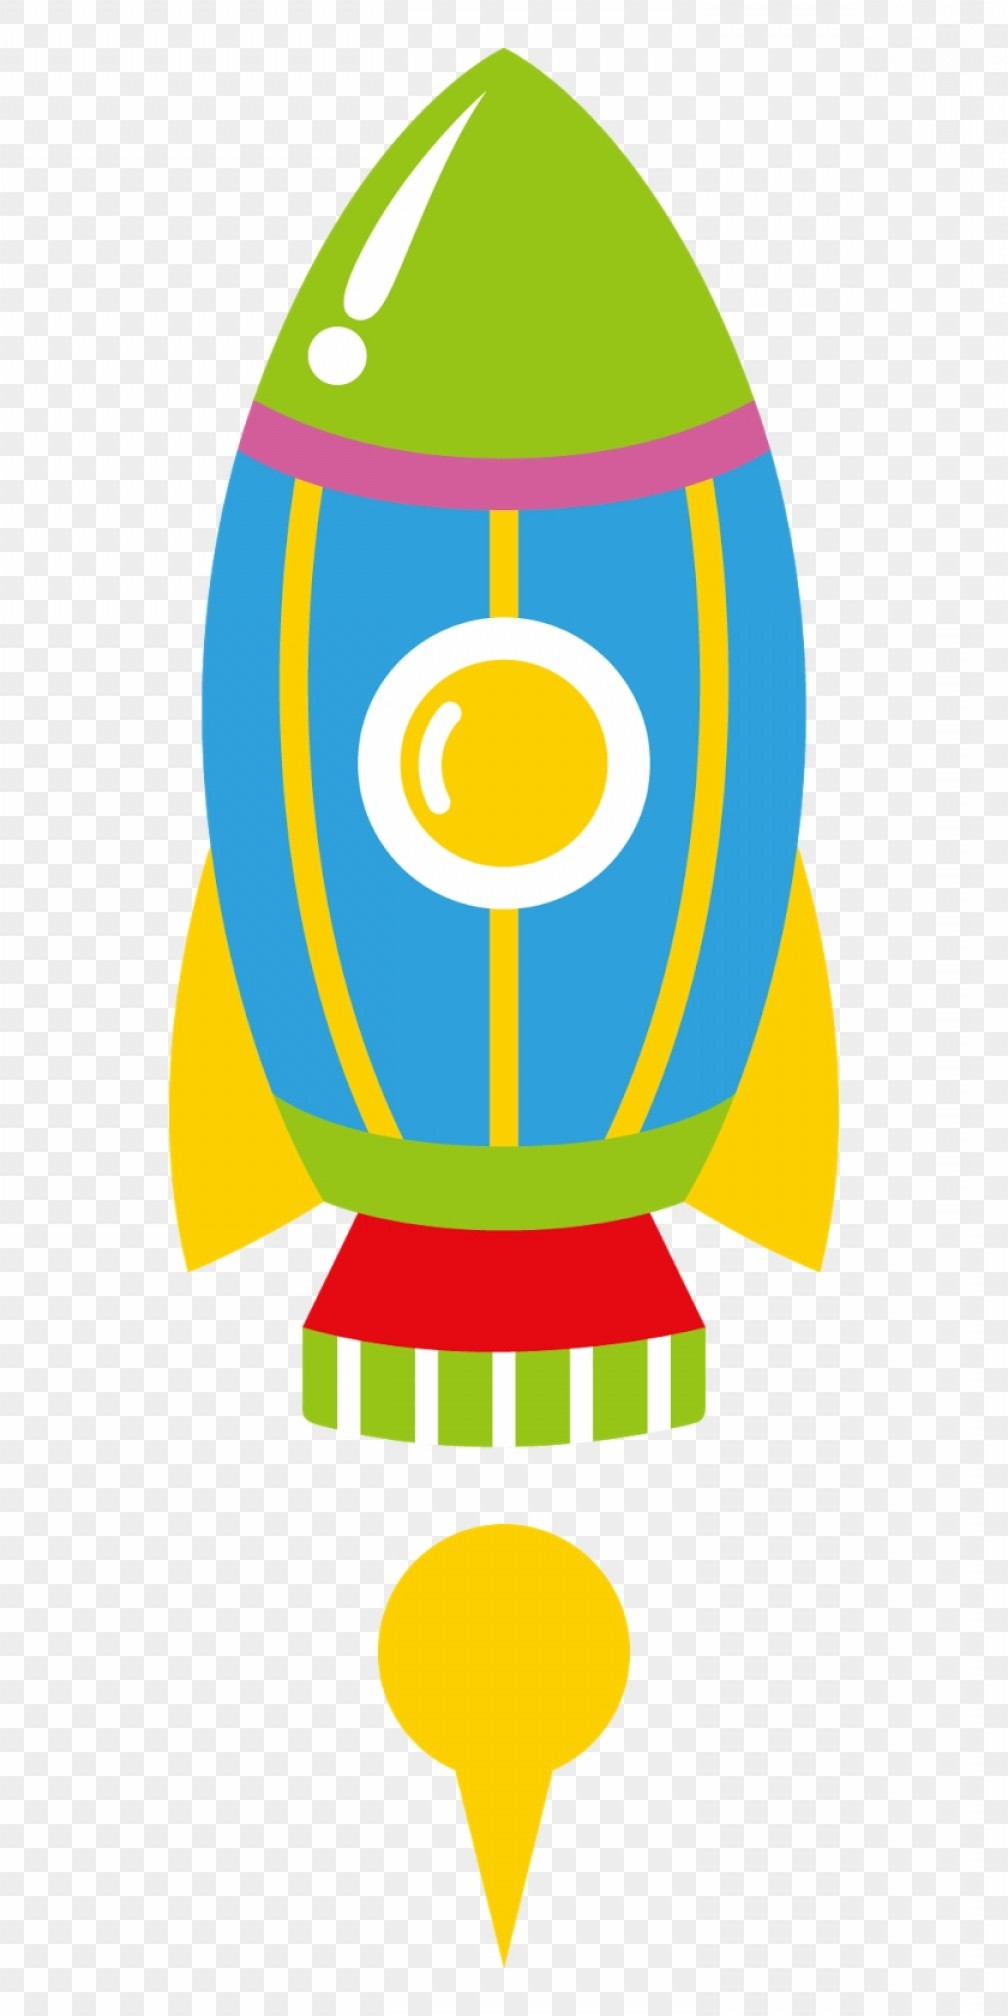 Mihmgiazaliens Astronauts And Spaceships How Fun Buzz Lightyear.